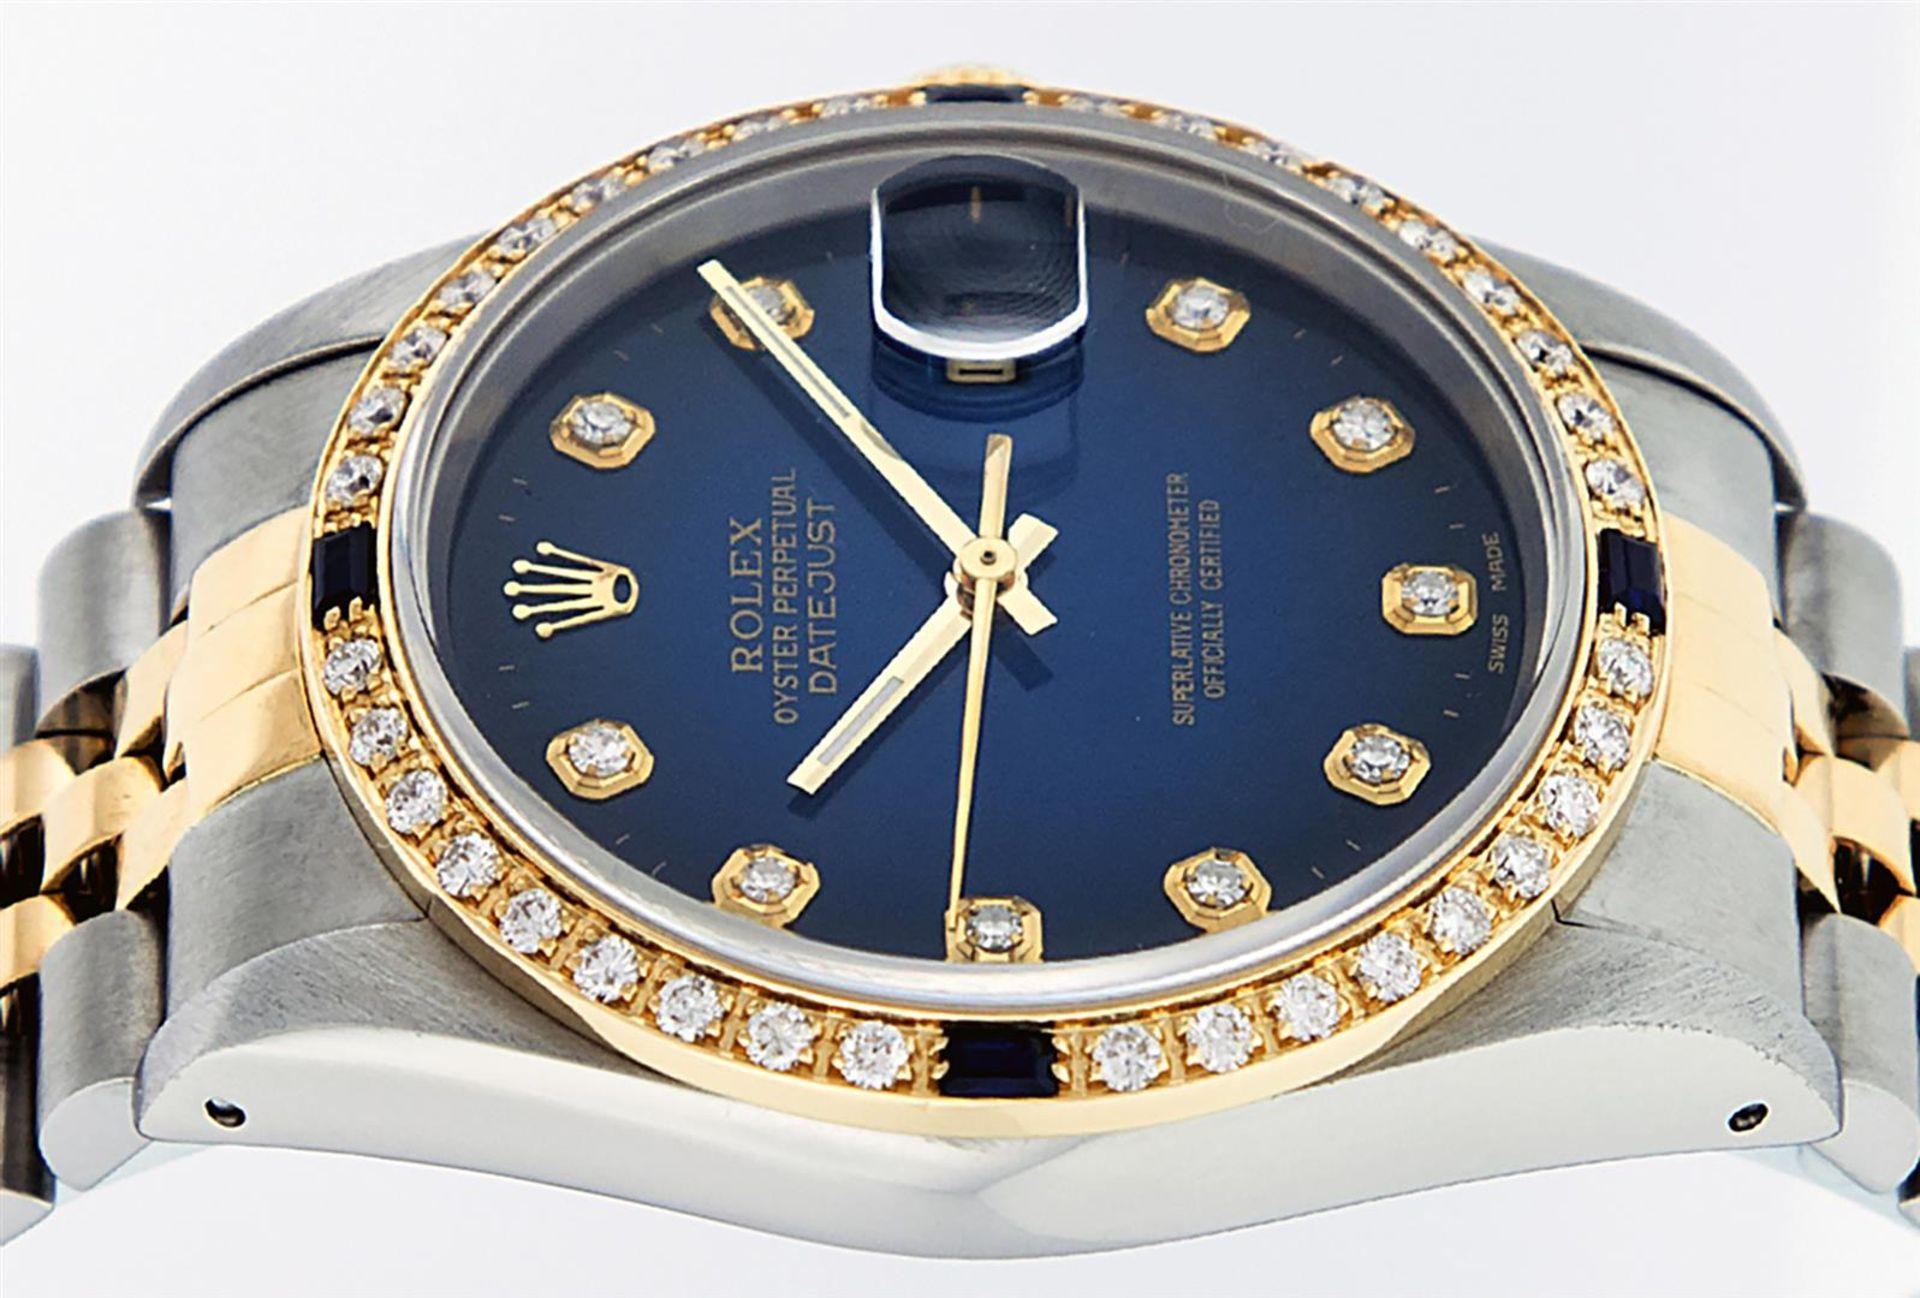 Rolex Mens 2 Tone Blue Vignette Diamond & Sapphire Datejust Wristwatch - Image 3 of 9